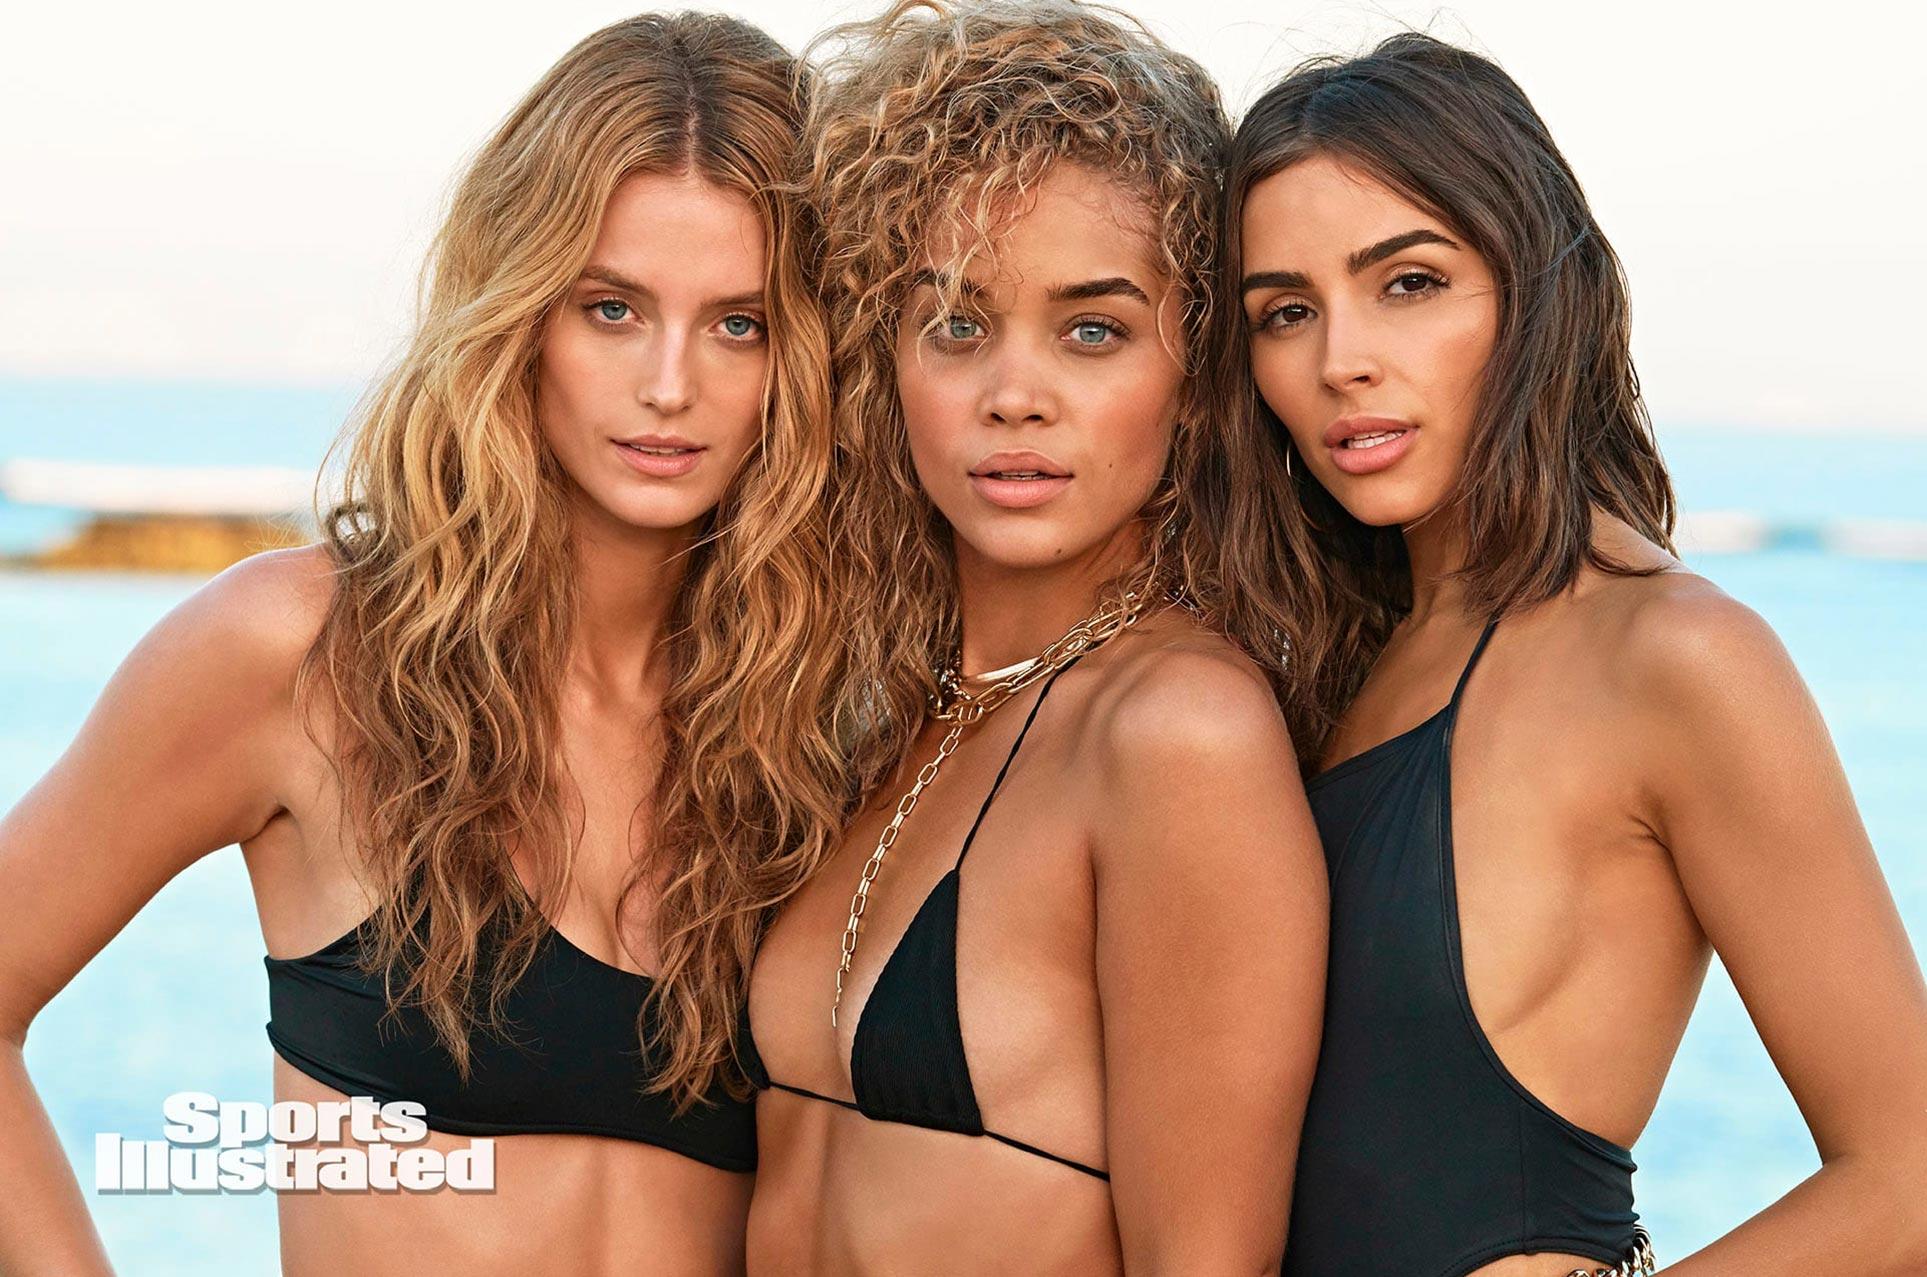 Кейт, Жасмин и Оливия в каталоге купальников Sports Illustrated Swimsuit 2020 / фото 17